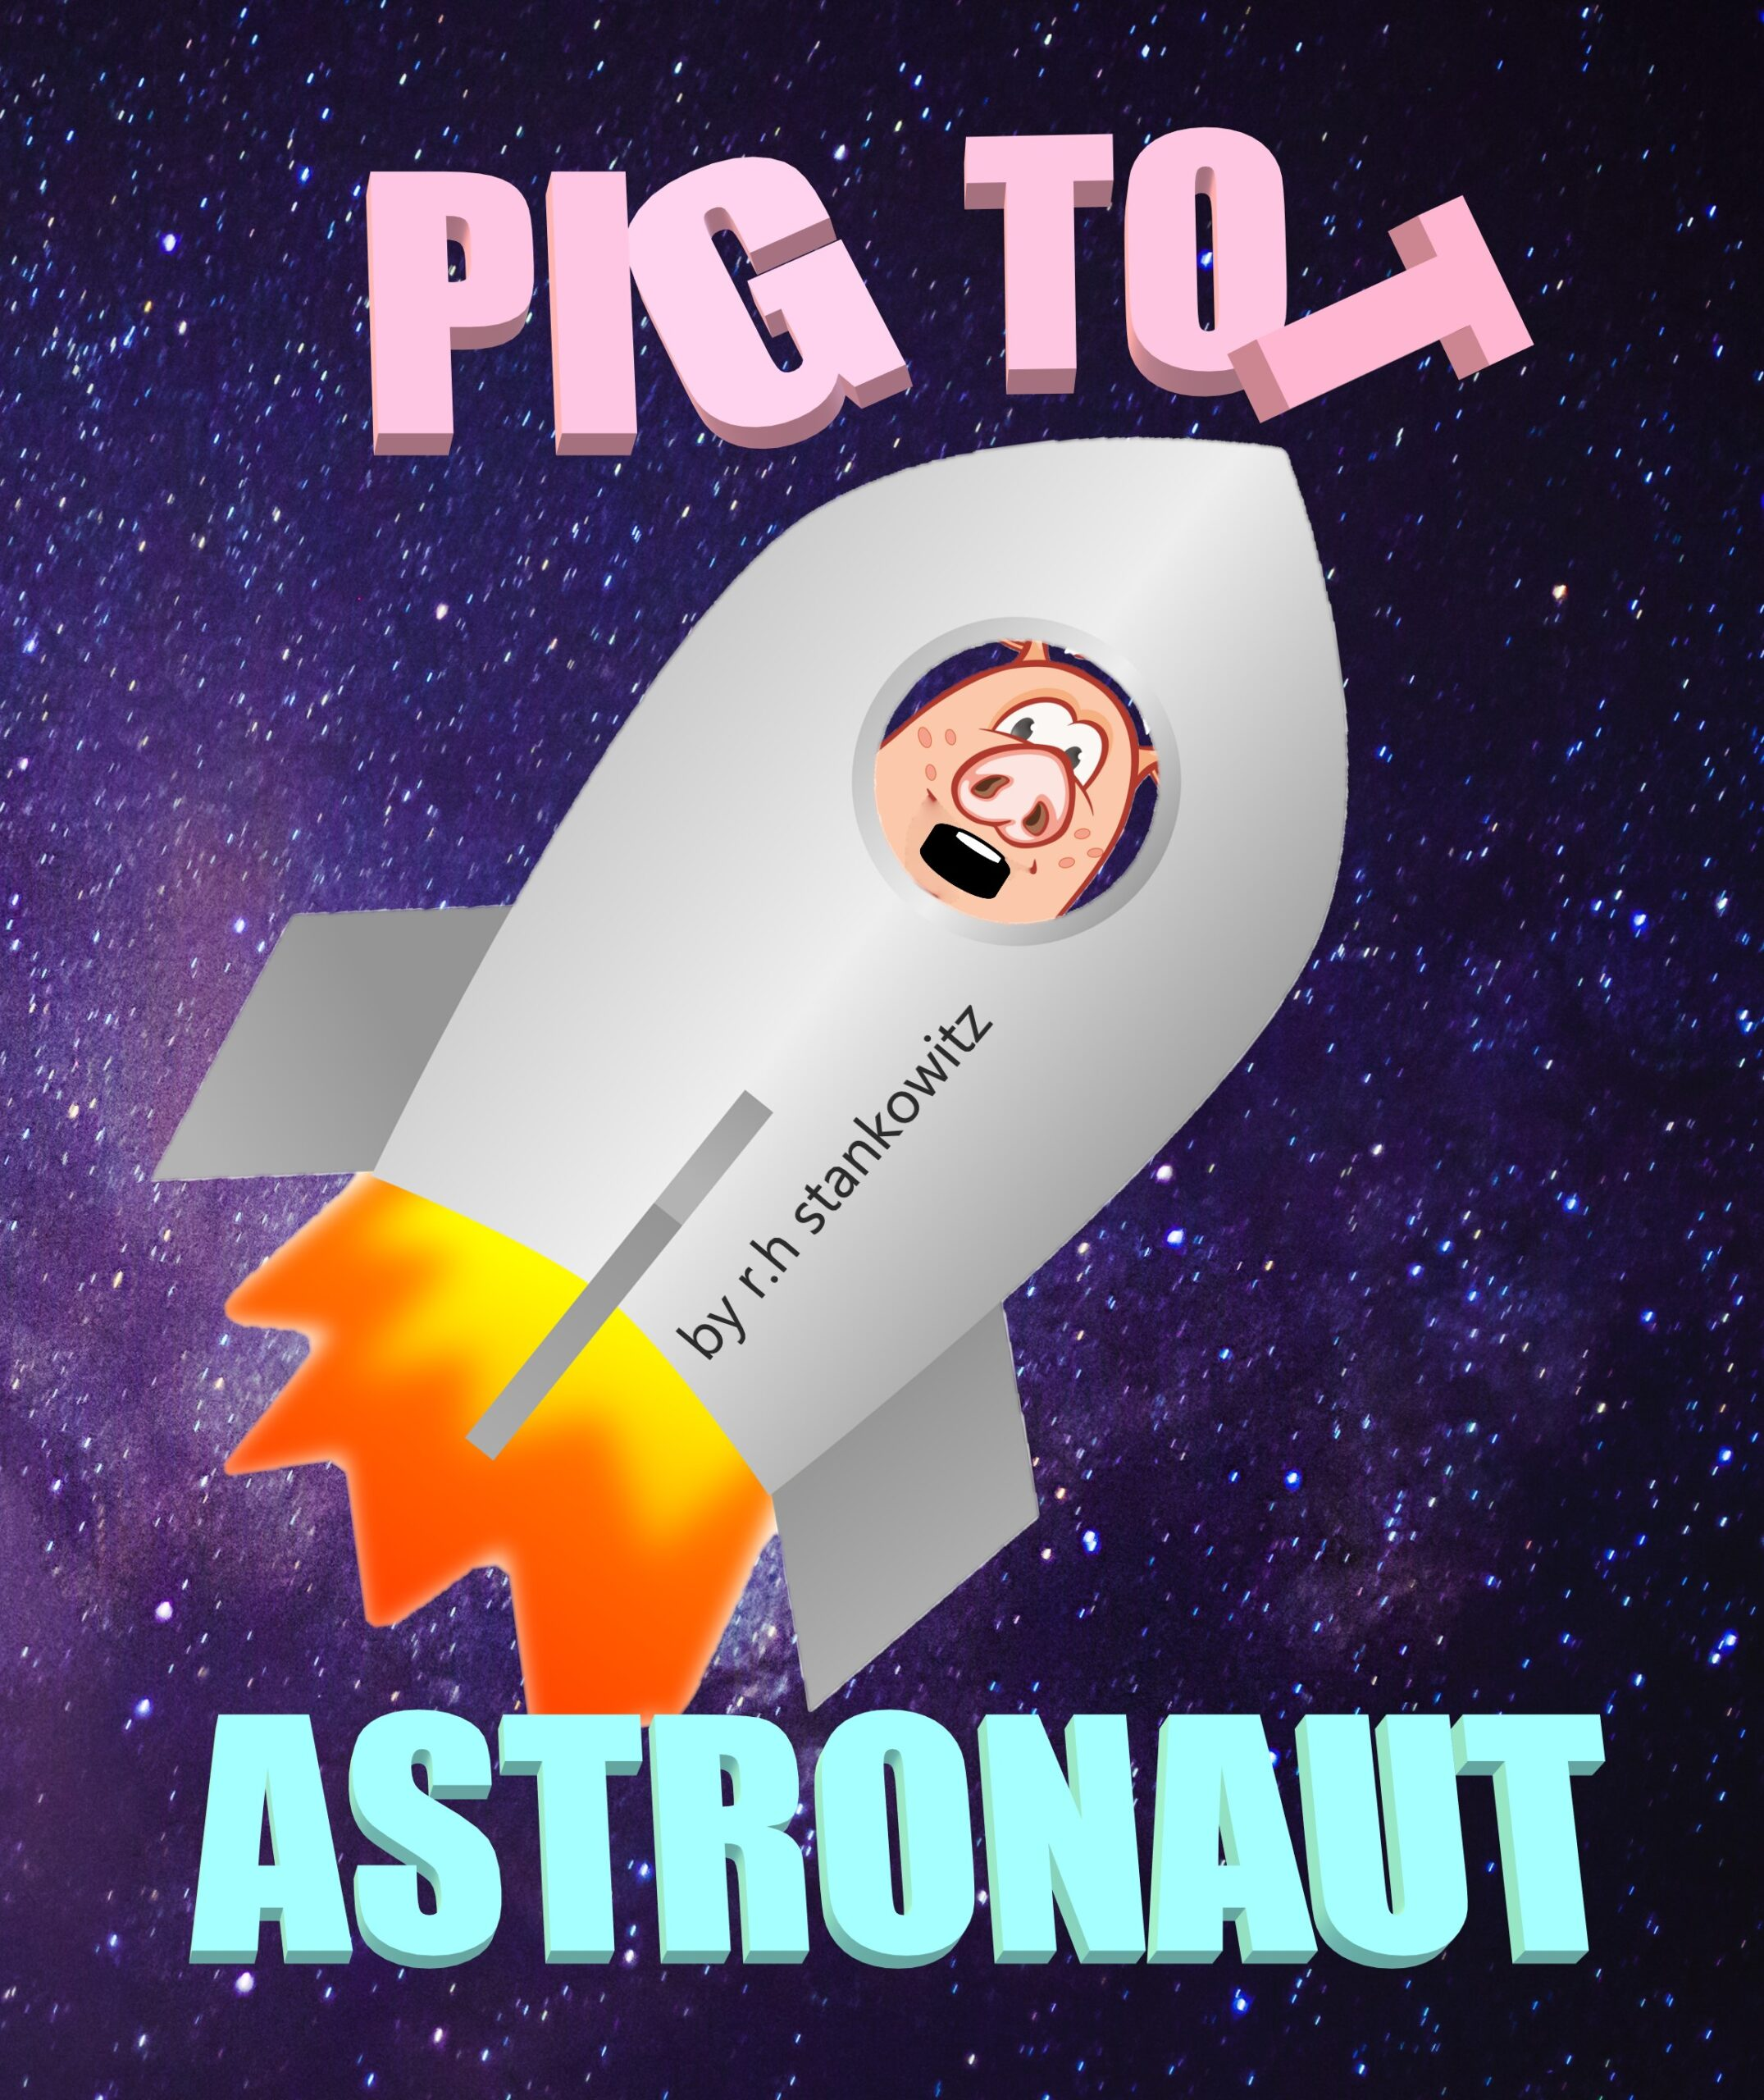 Pig Tot Astronaut